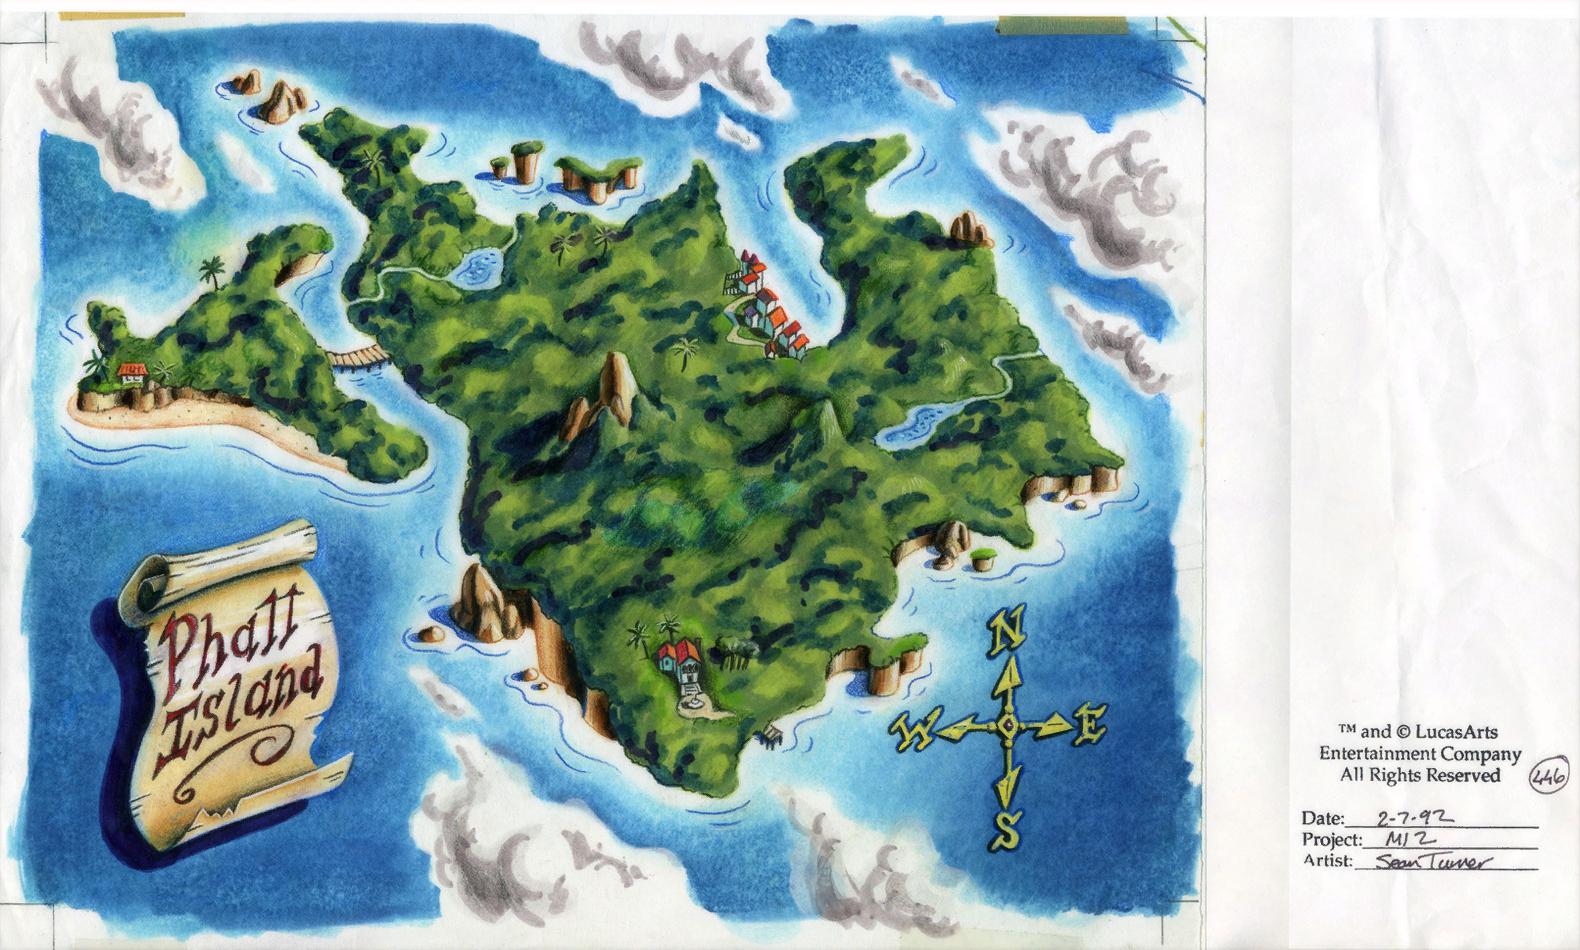 Monkey island 2 lechuck s revenge concept art the international - Original Background Drawing For The Phatt Island Map The Bridge Leading To Rum Rogers